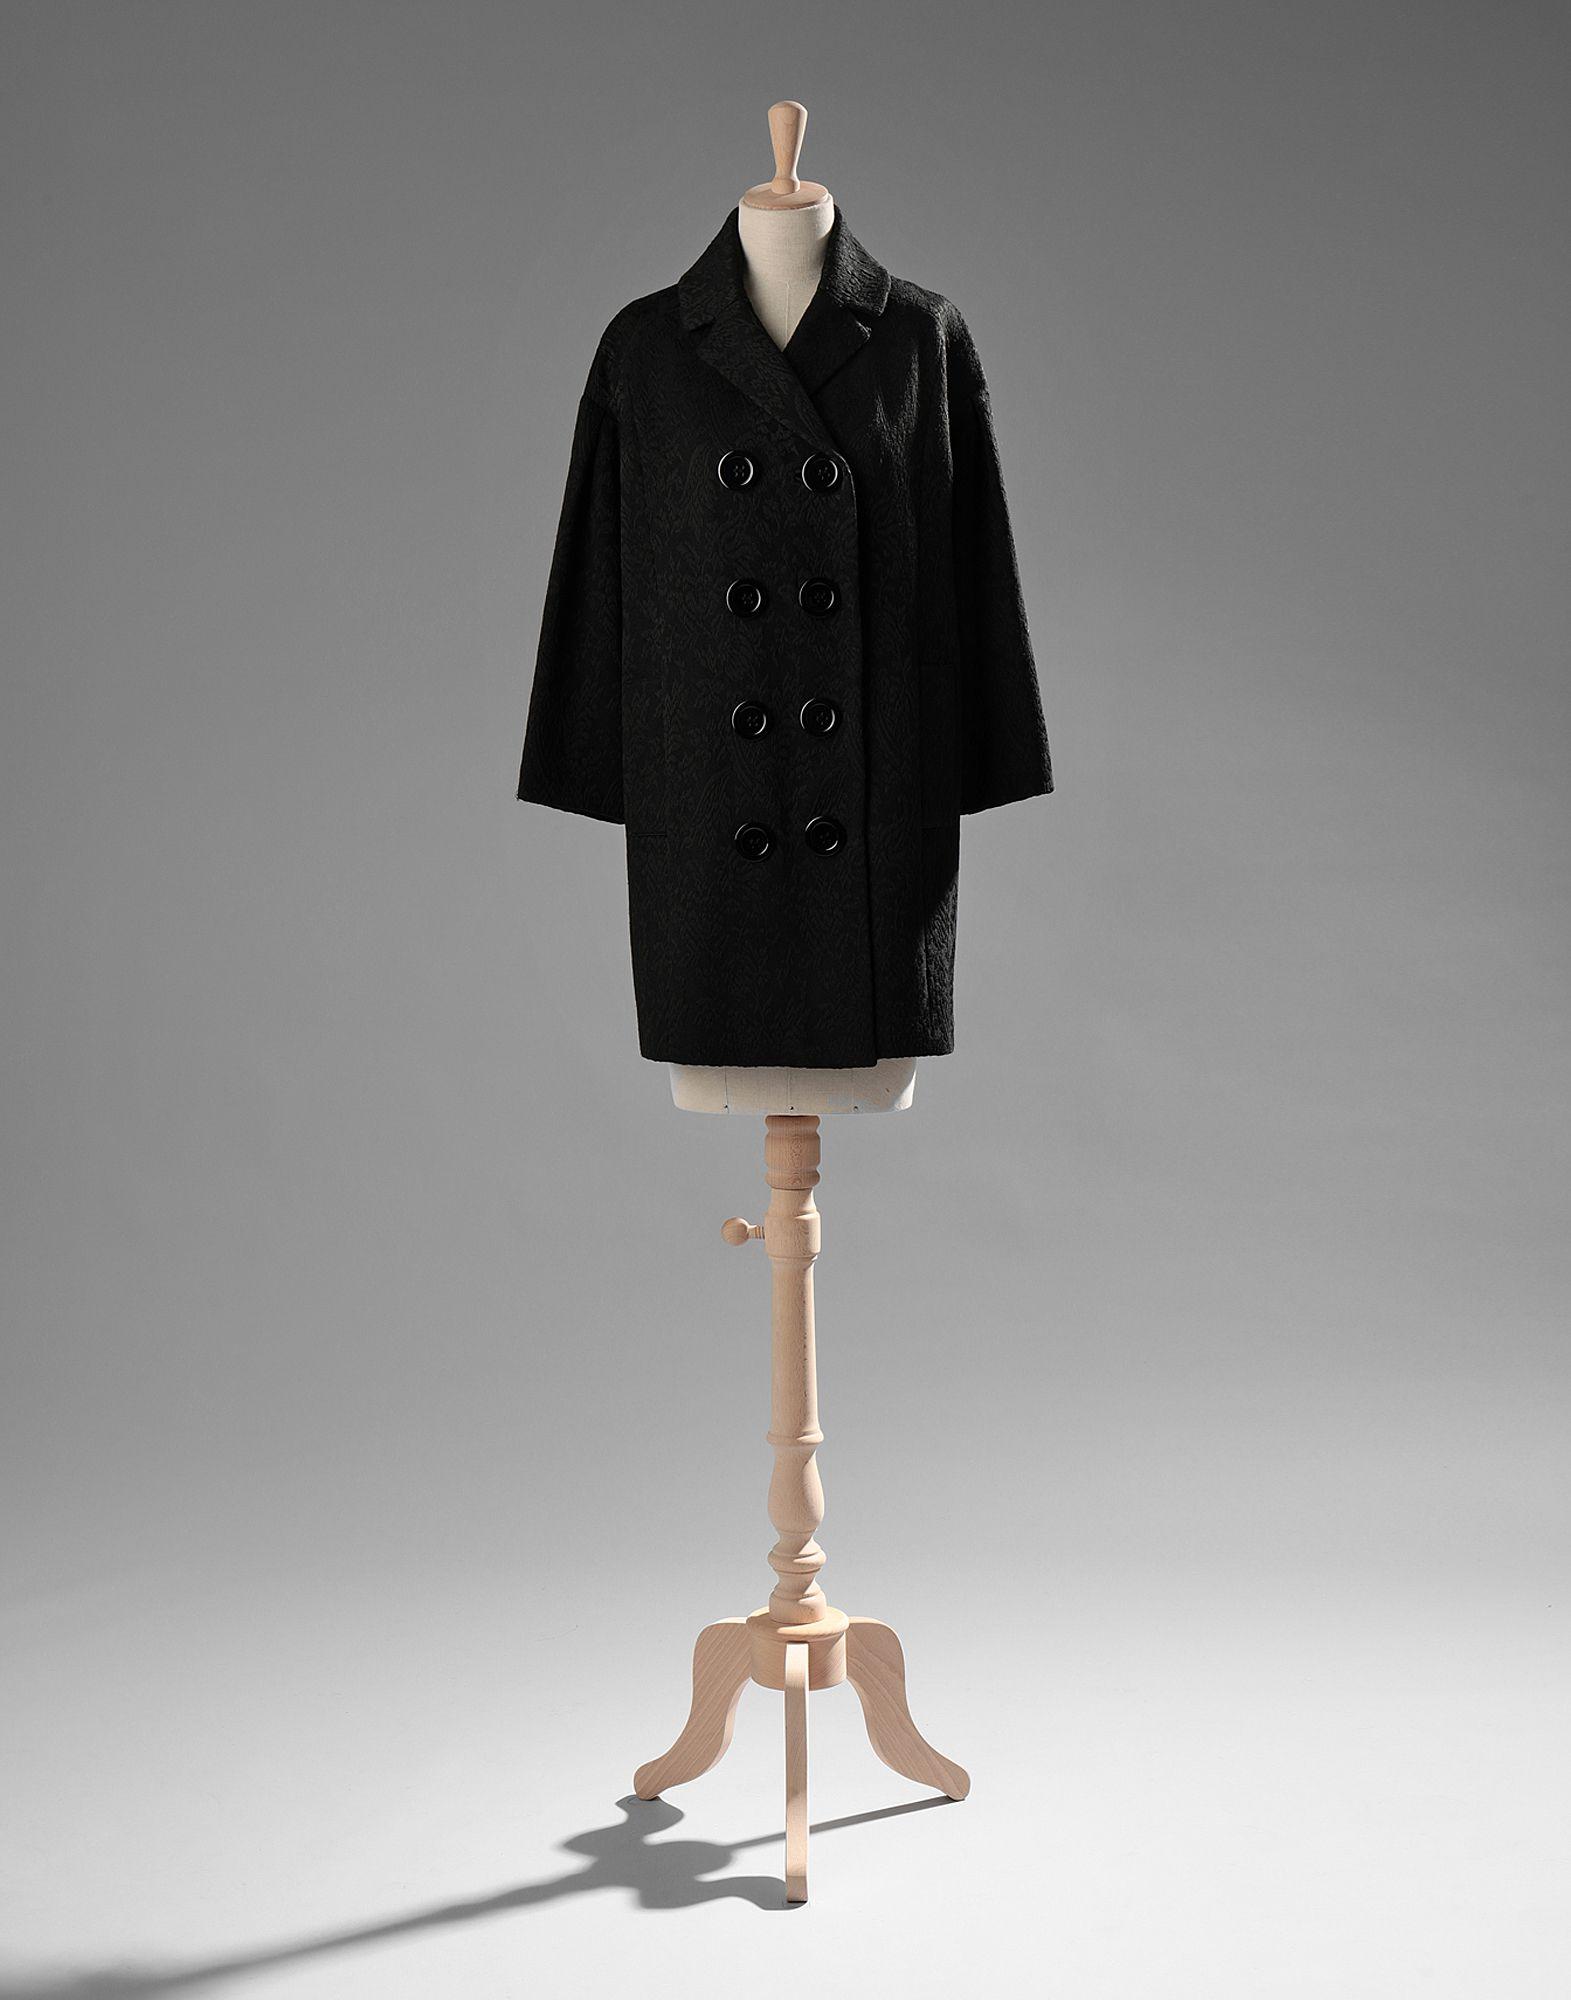 Фото - DOLCE & GABBANA Пальто contact s brand luxury handbags women bags designer genuine leather crossbody bag for messenger female shoulder